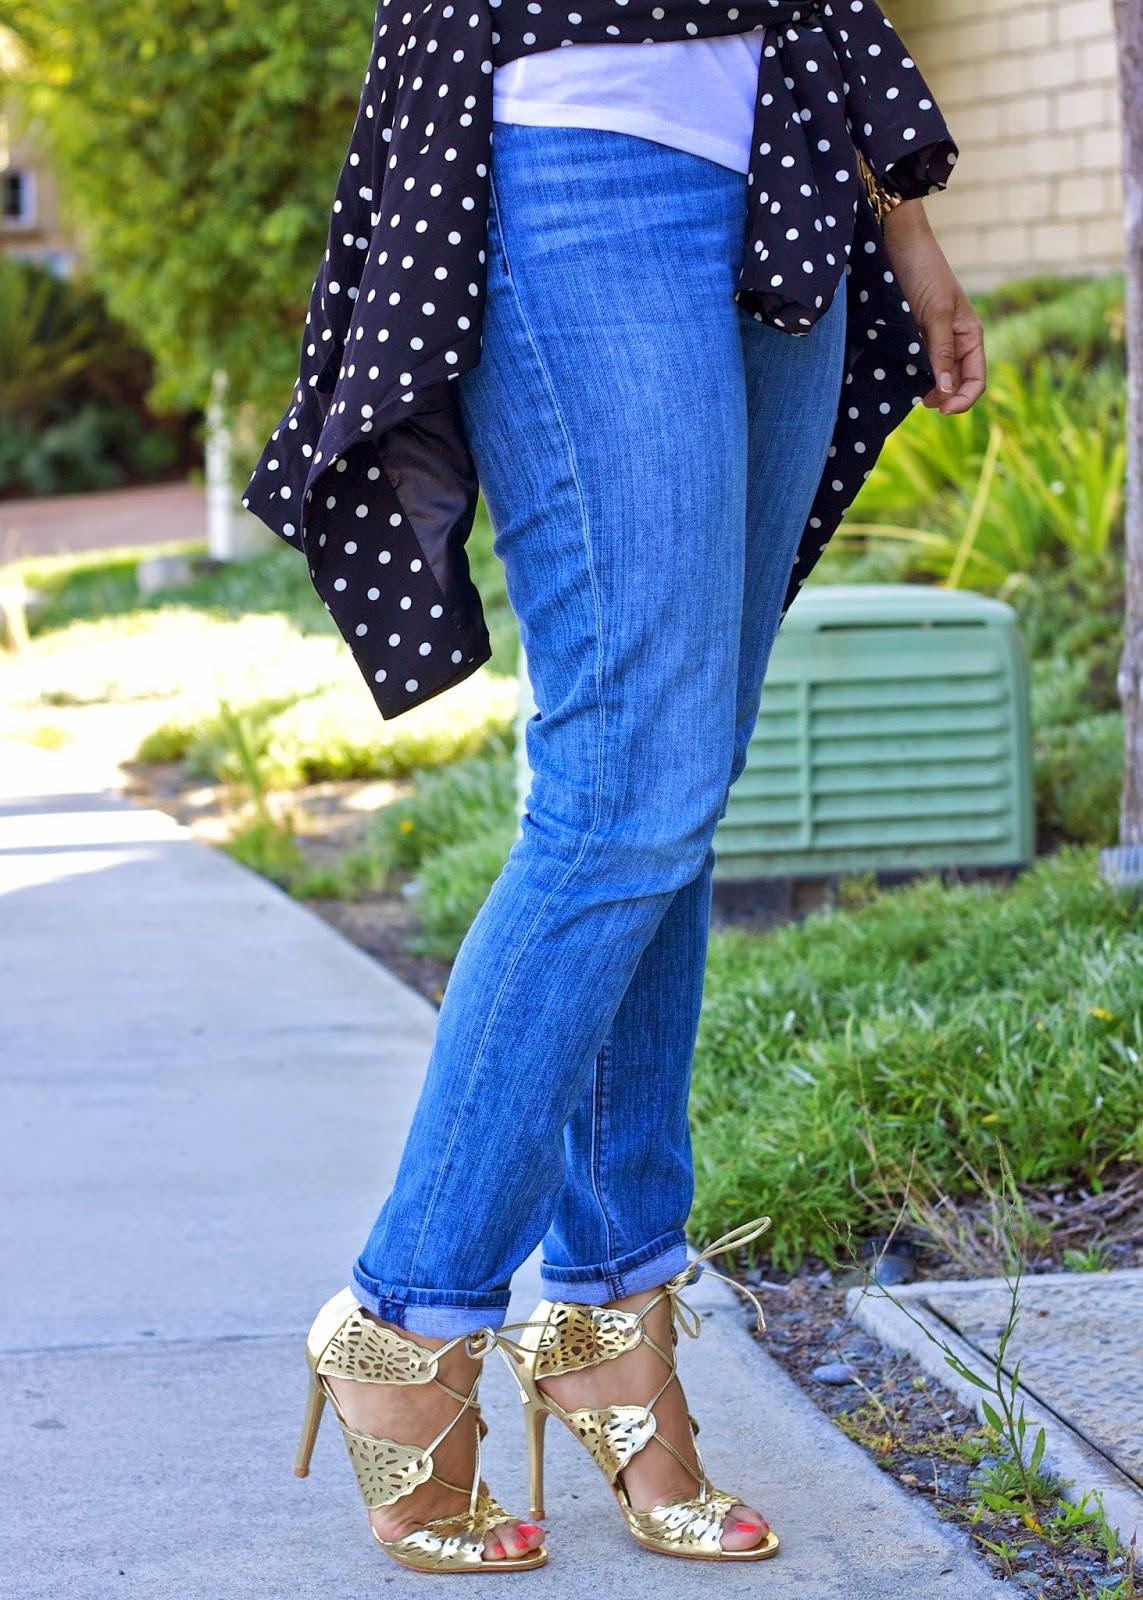 gold lace up sandals, gold heel sandals, hudson gia jeans, hudson skinny jeans blogger, san diego blogger, fashion week sd